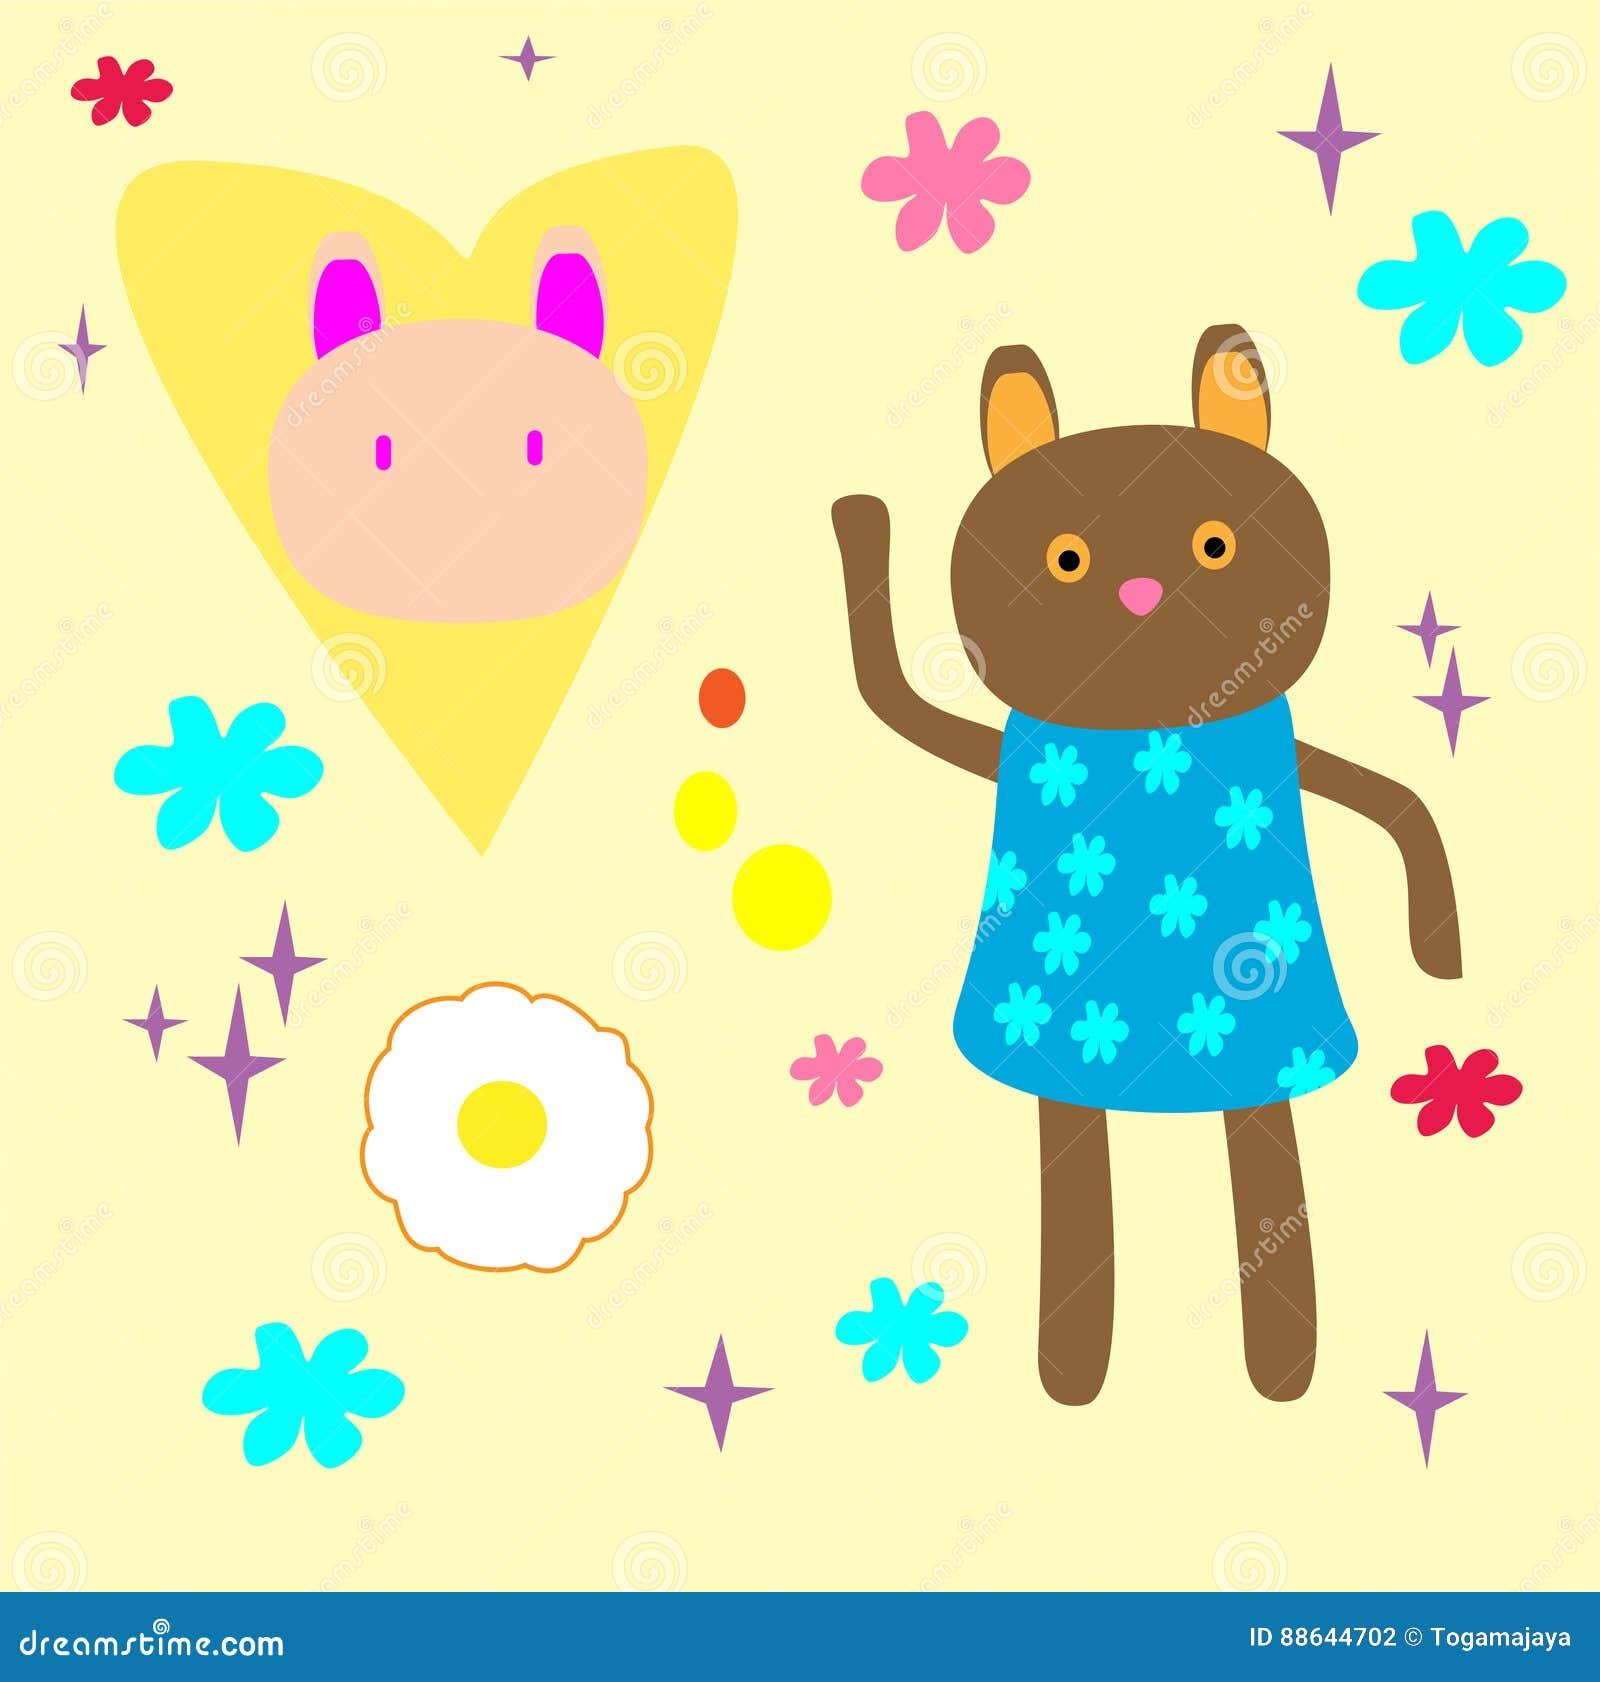 Cute Bear Cartoon for website, marketing, public advertaising, fun design for wallpaper, drawing book, poster